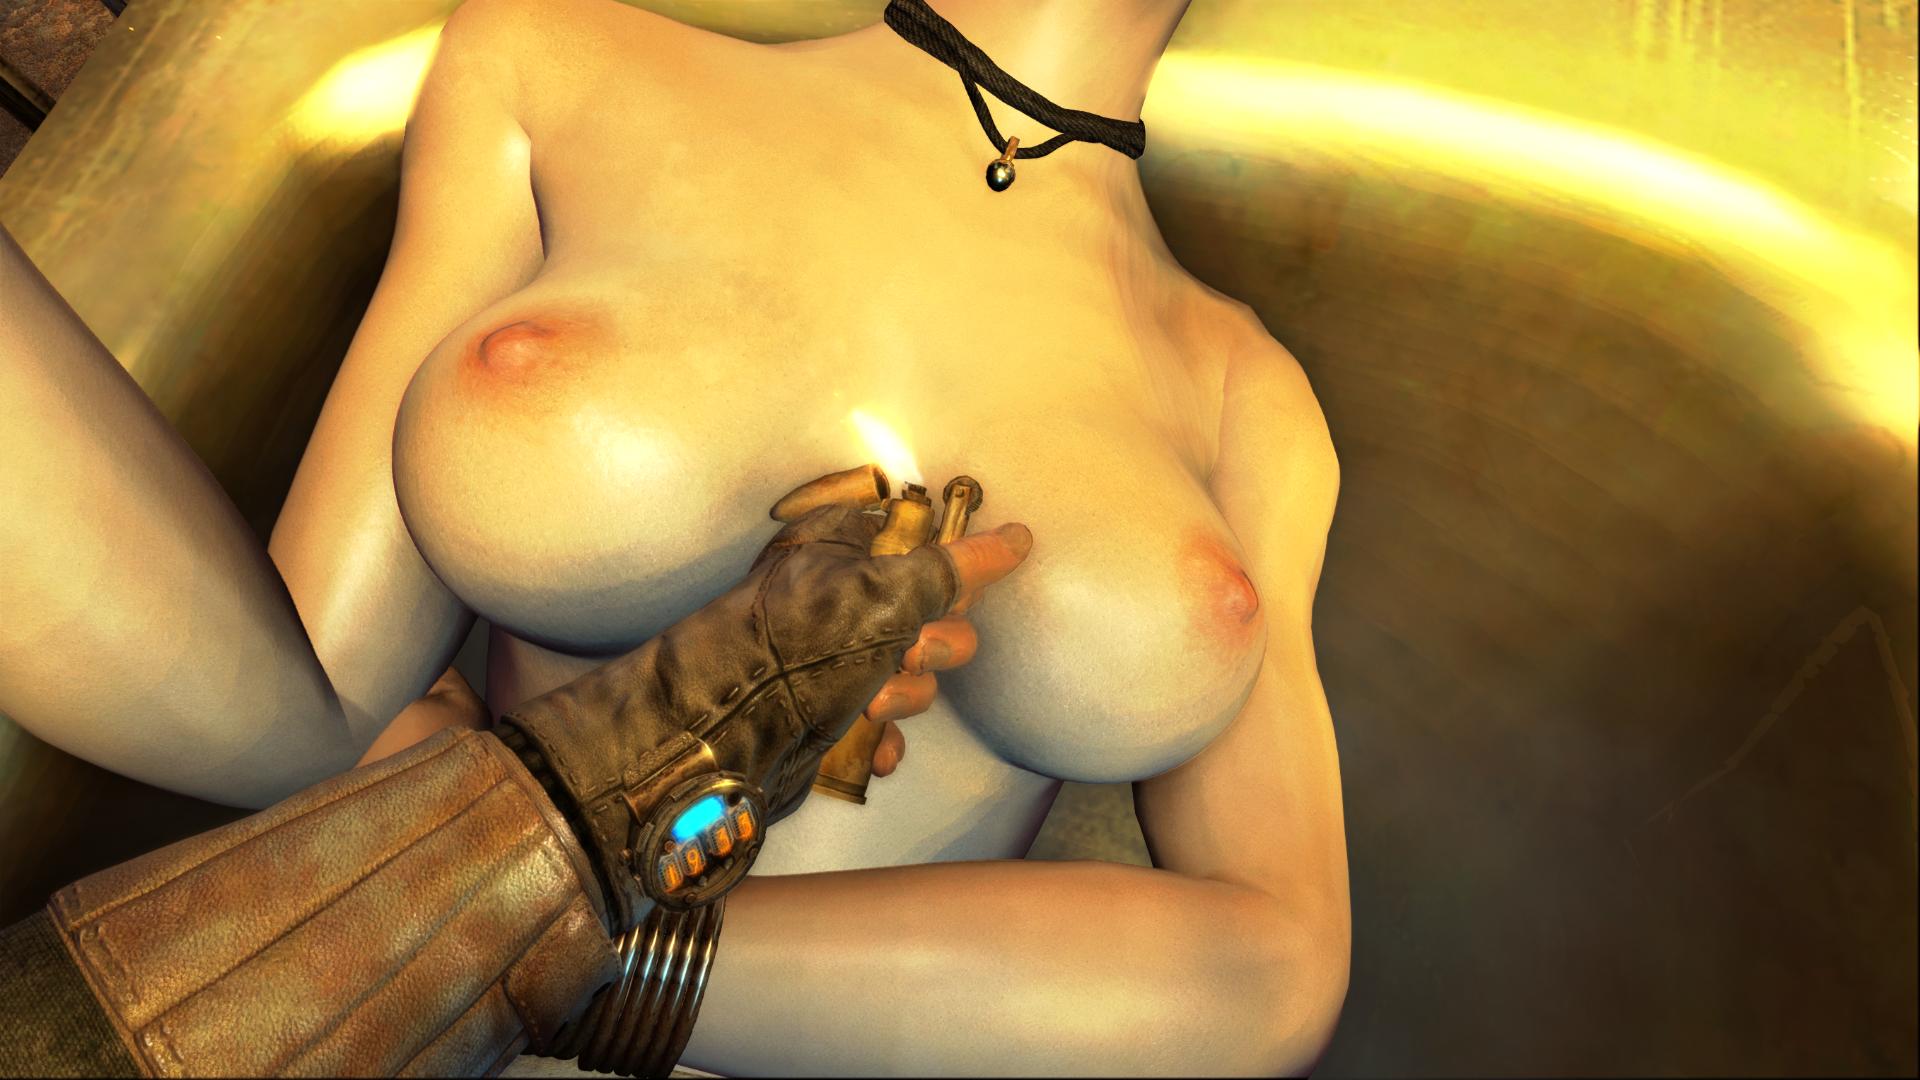 сиськи в играх видео и фото запрещен